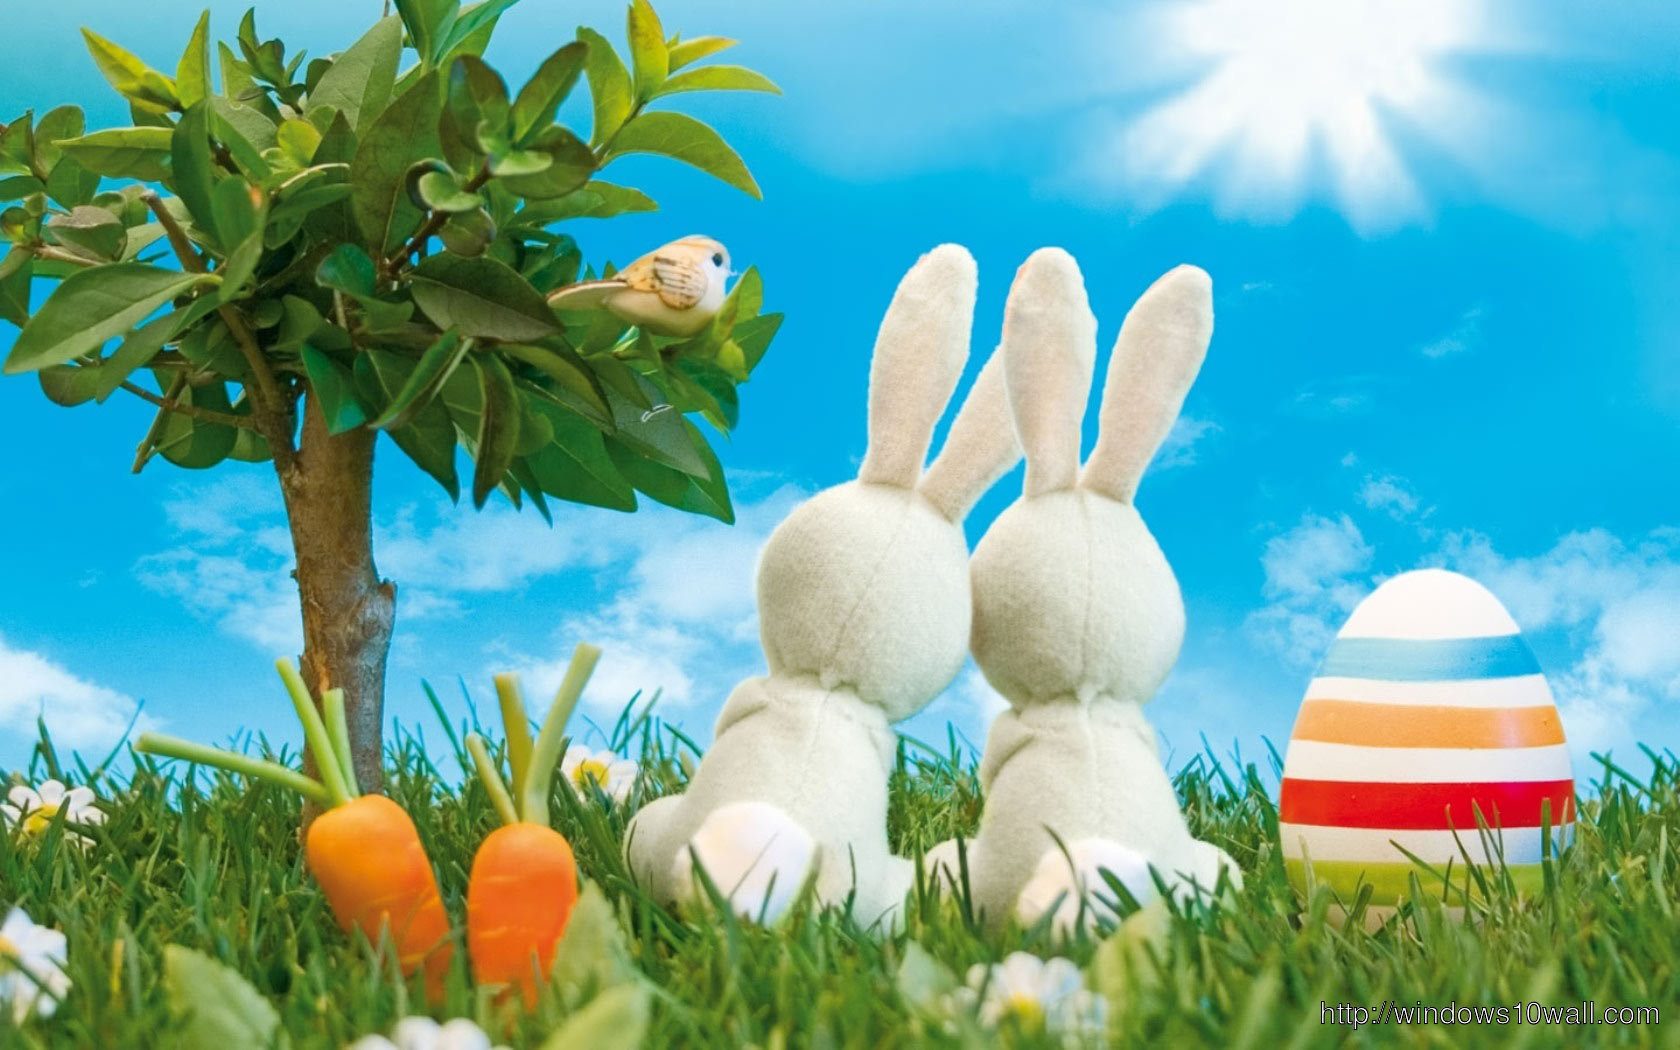 Happy Easter Bunny Full HD Wallpaper - windows 10 Wallpapers